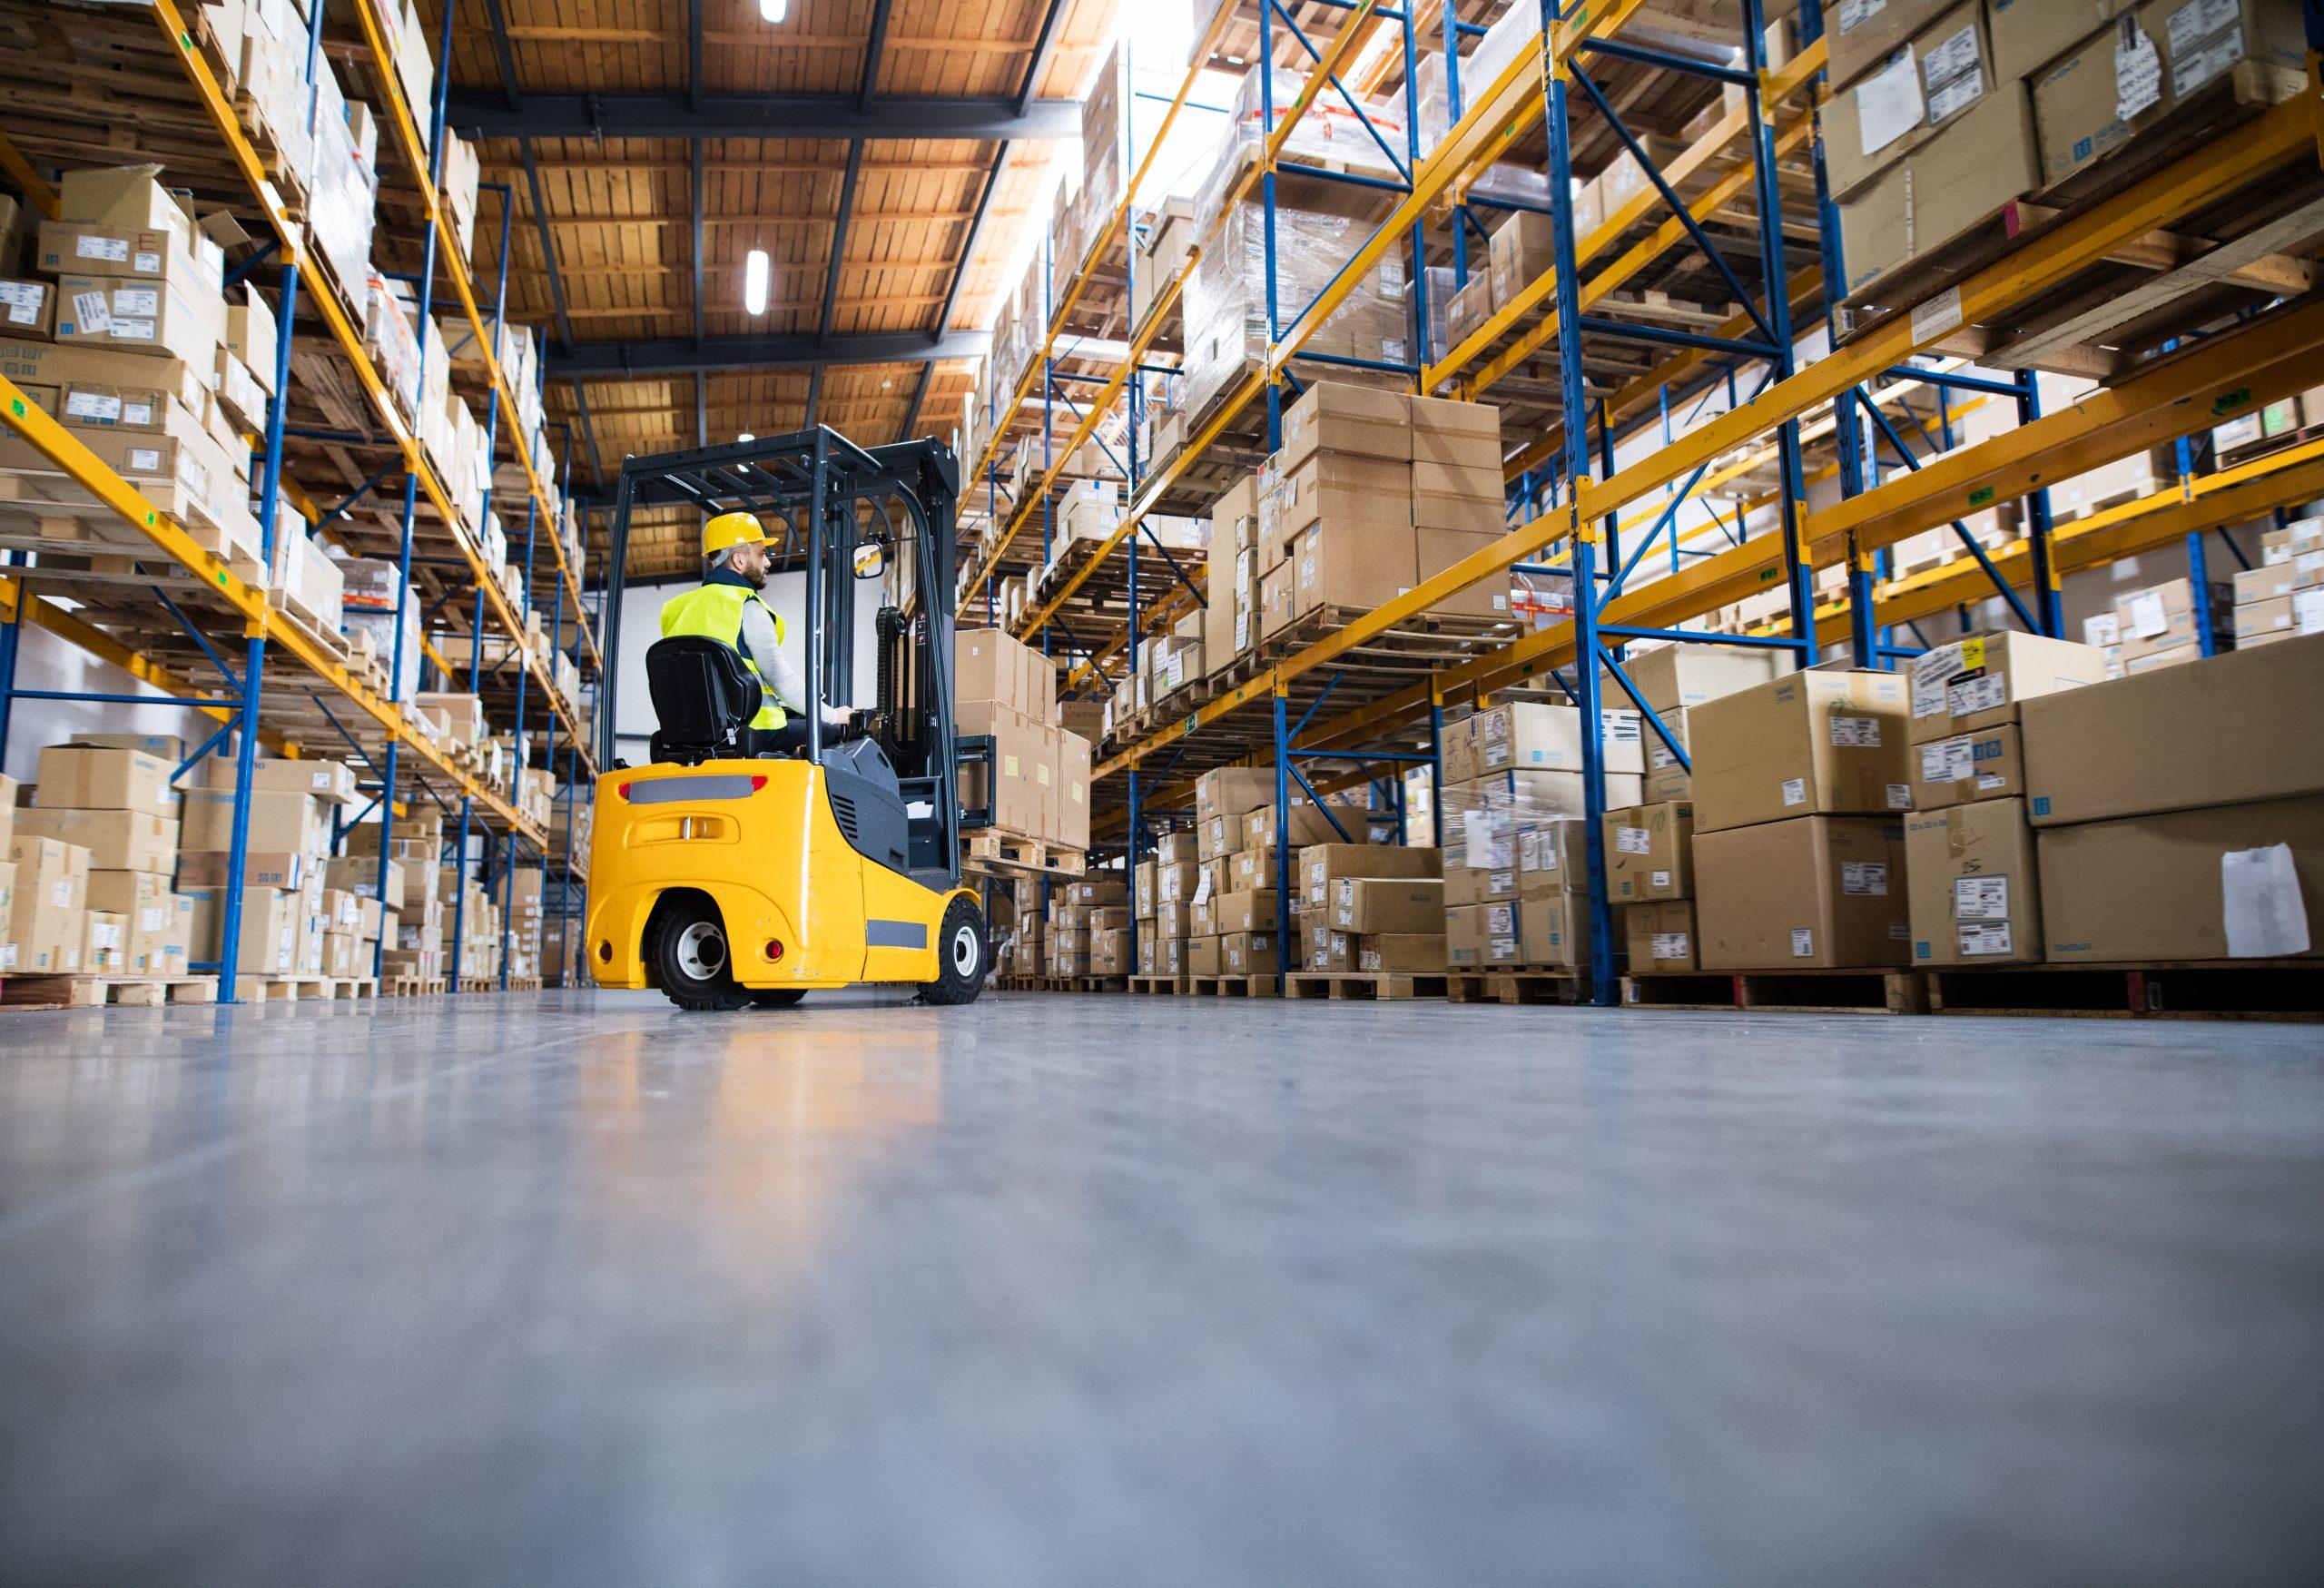 Warehousing and fulfillment